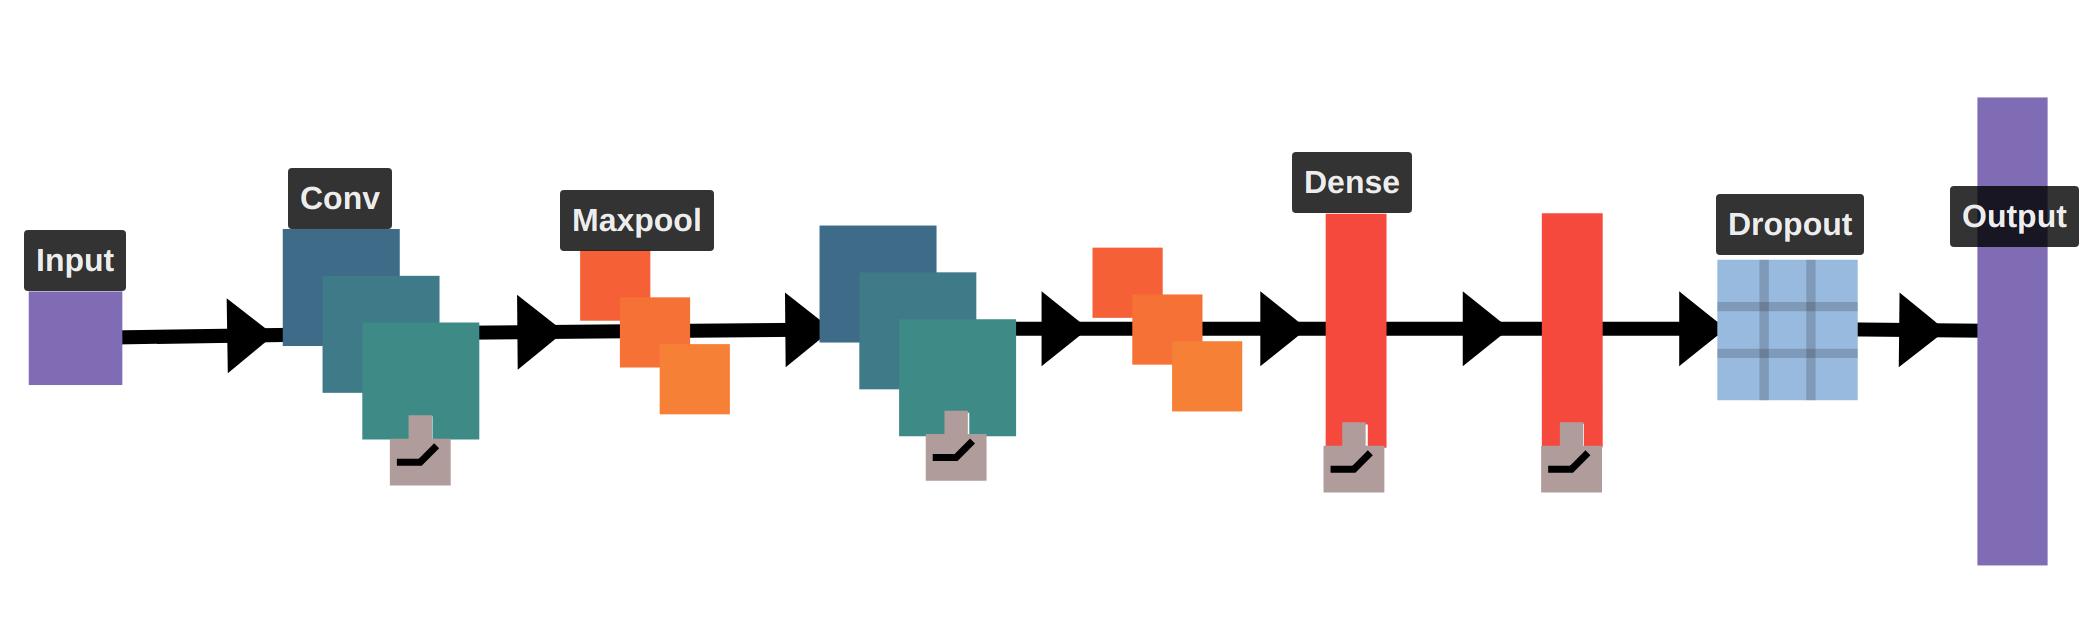 A visualization of a LeNet-like architecture